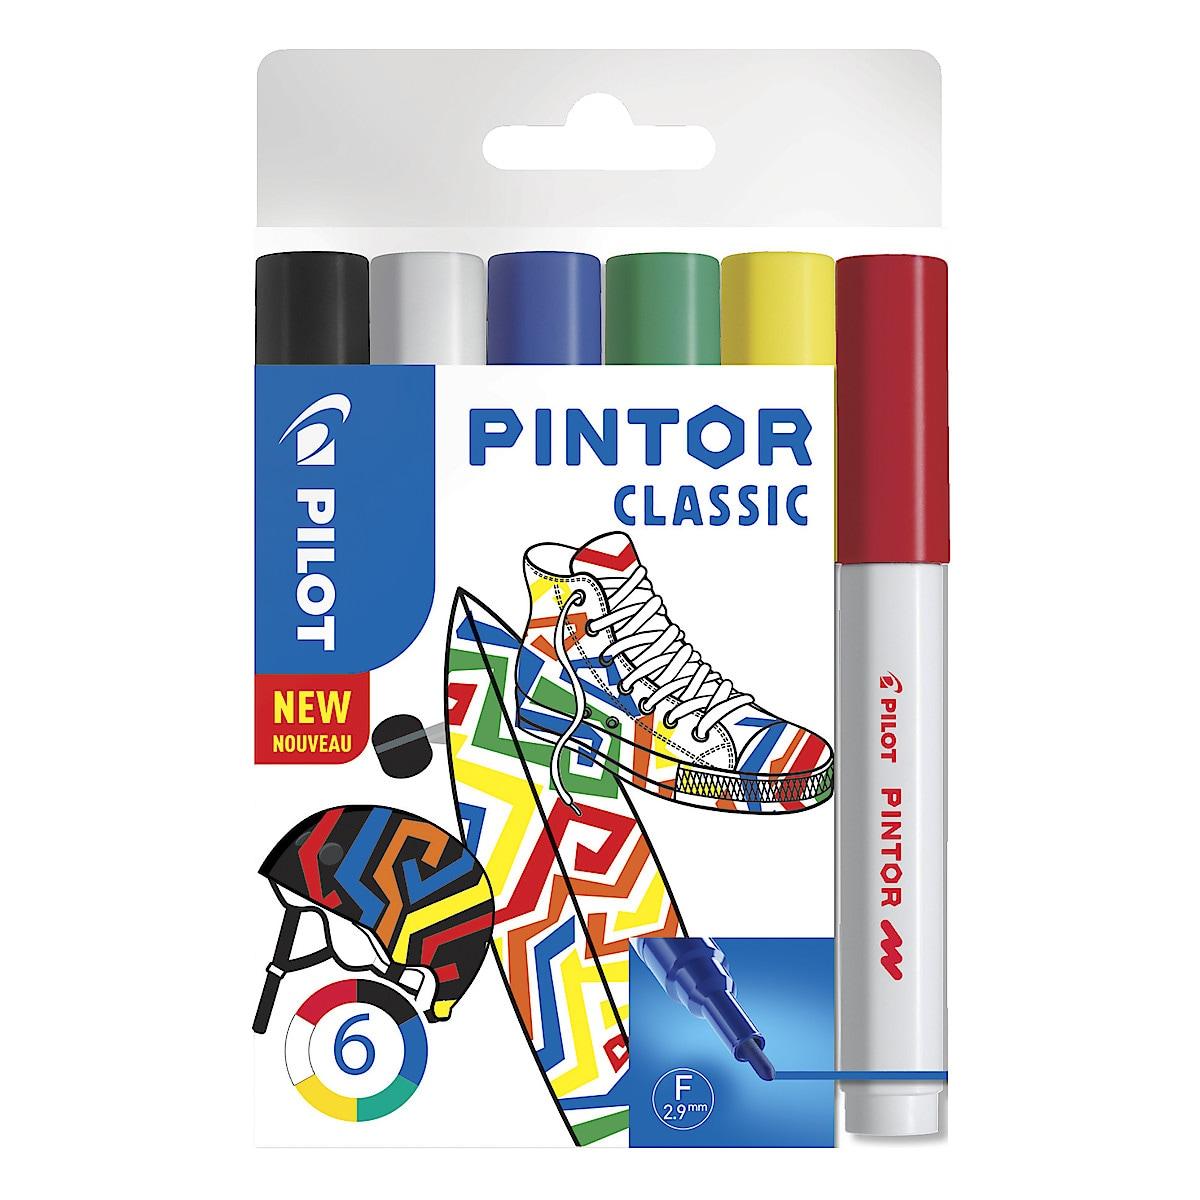 Märkpennor Pilot Pintor classic 6-pack